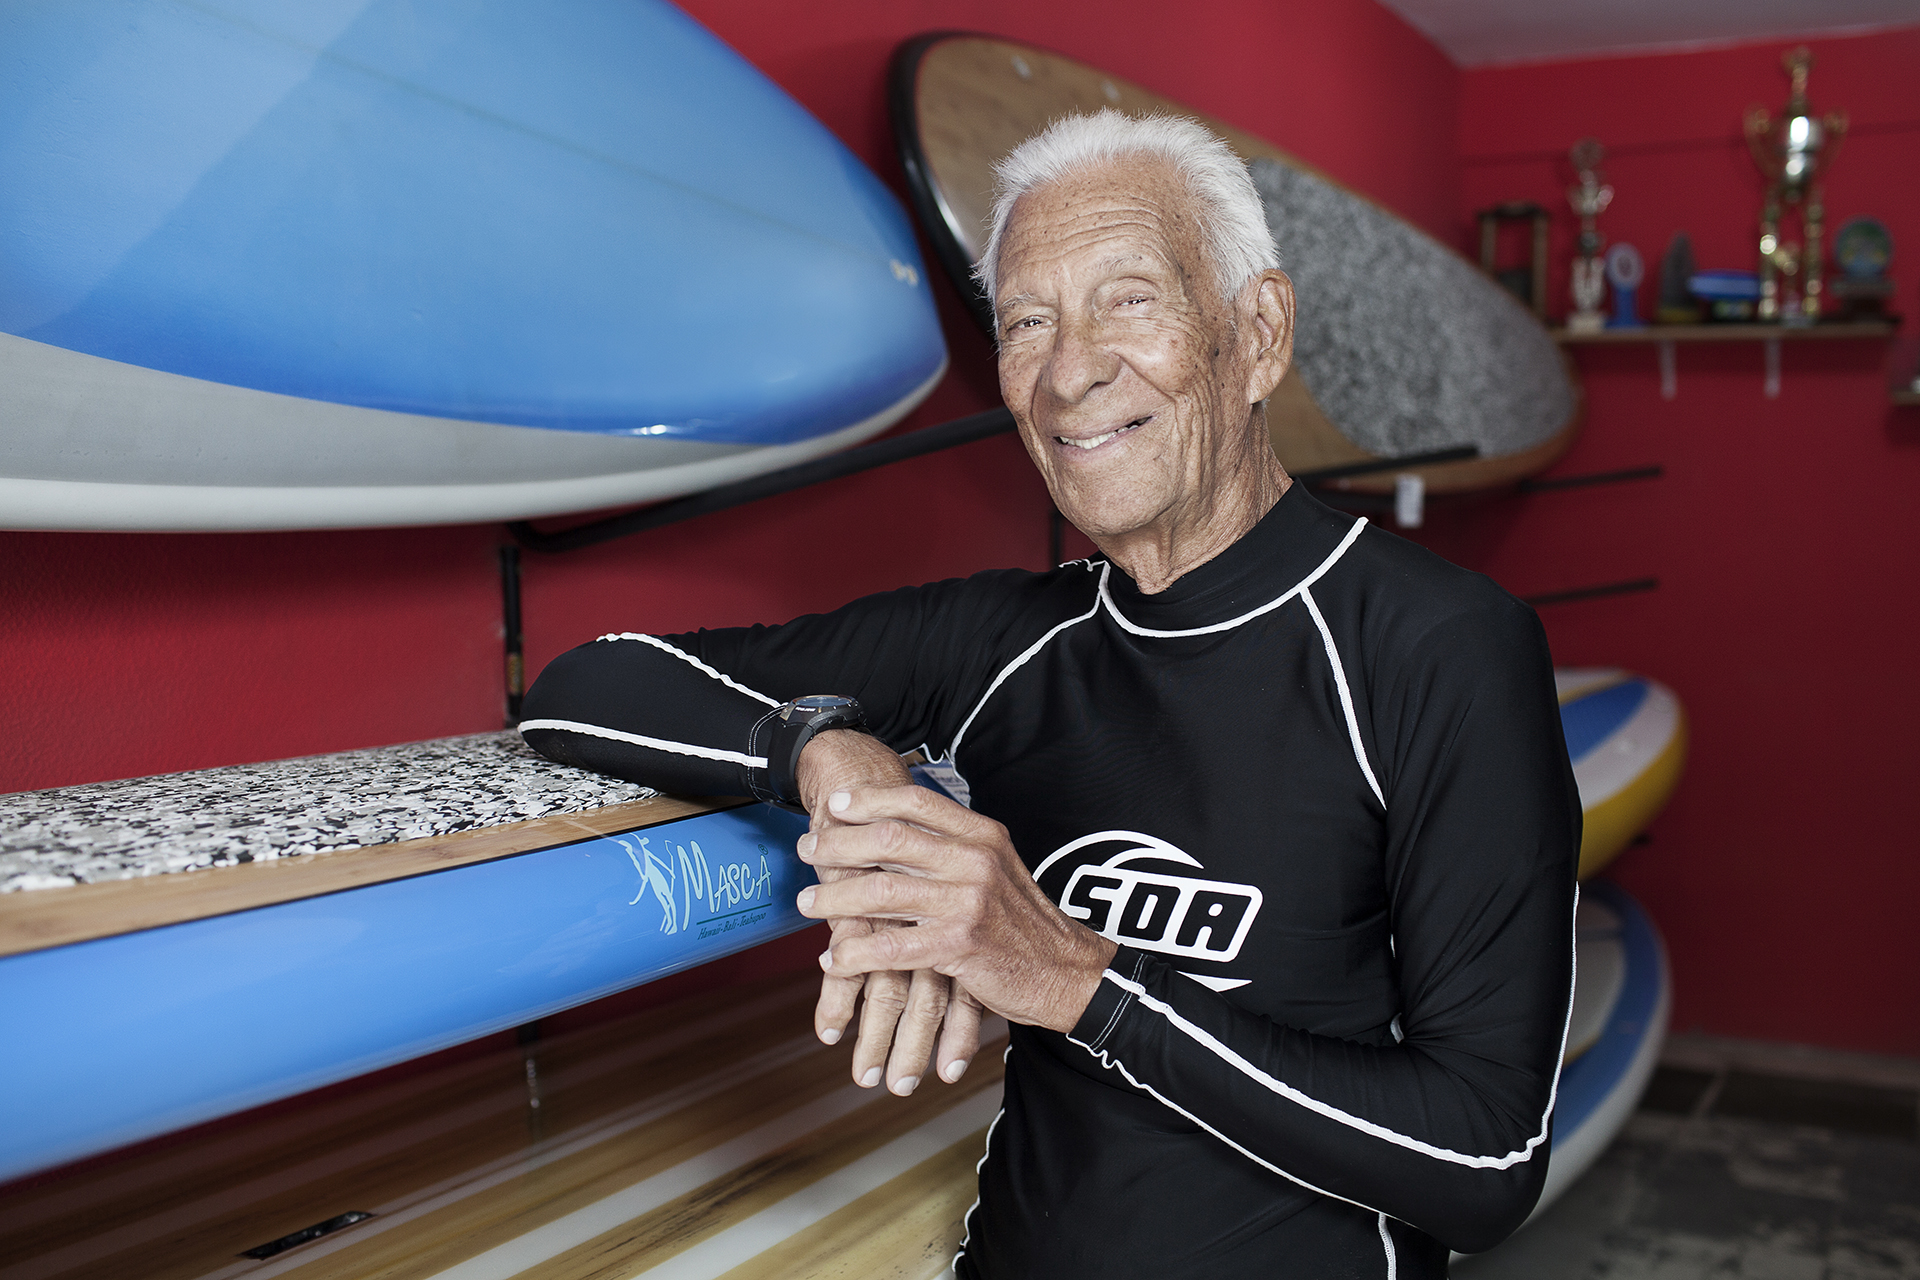 Afonso Freitas, surfer